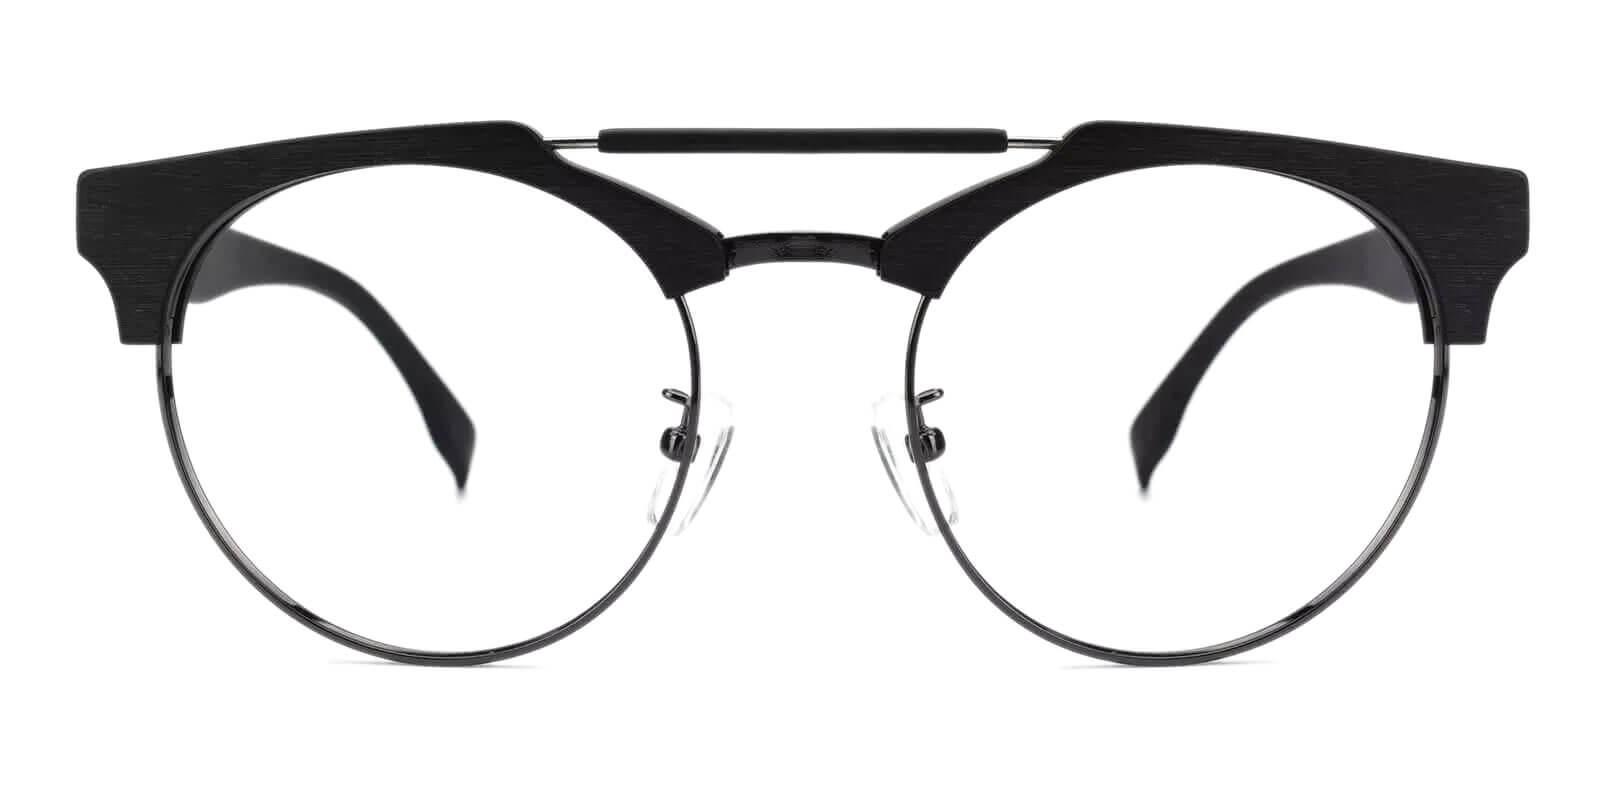 Orbisonia Black Combination NosePads , Eyeglasses Frames from ABBE Glasses